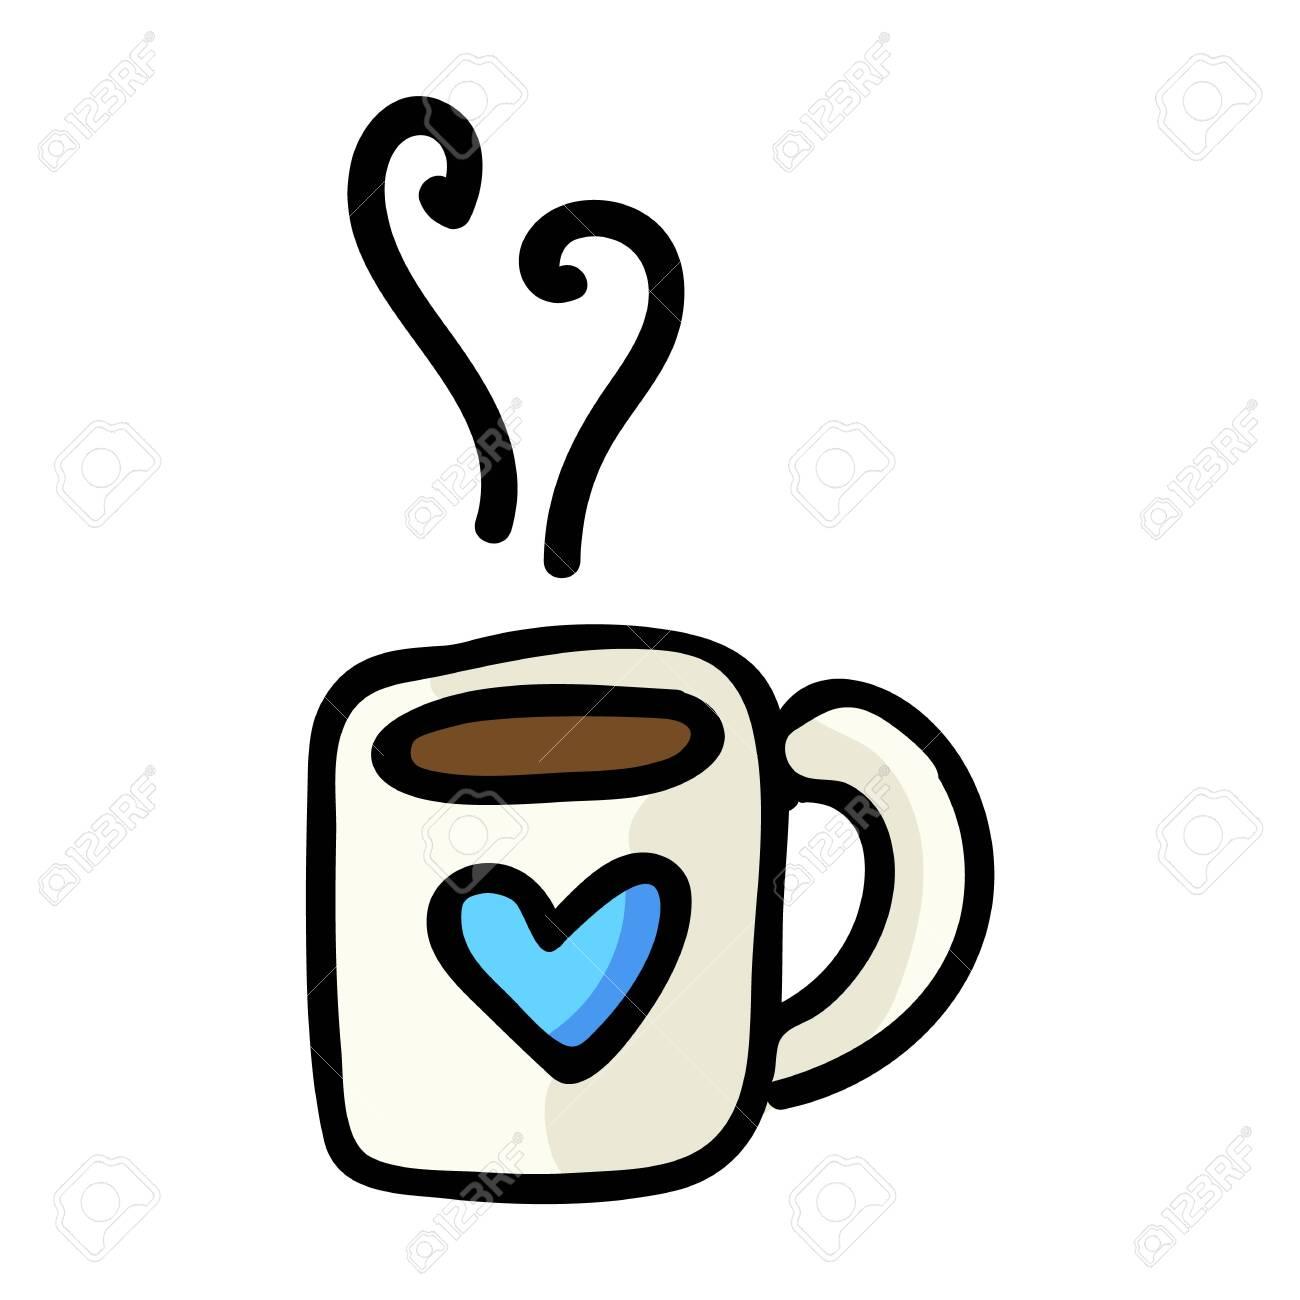 Cute Tea Mug Cartoon Vector Illustration Hand Drawn Hot Drink Royalty Free Cliparts Vectors And Stock Illustration Image 135525073